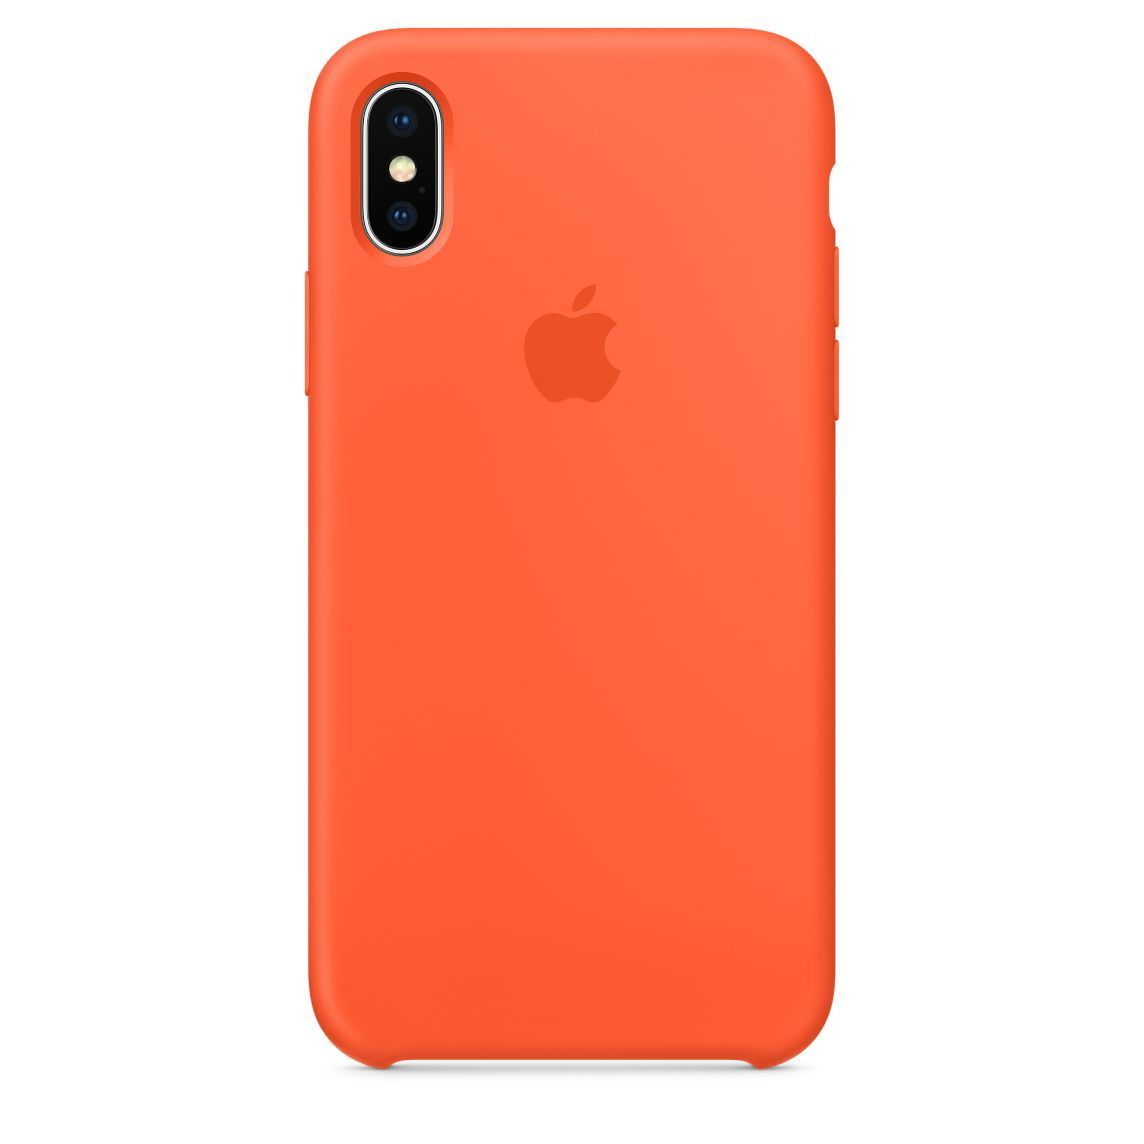 Pin Von Michelle Auf Iphone Apple Apple Produkte Iphone Hulle Iphone